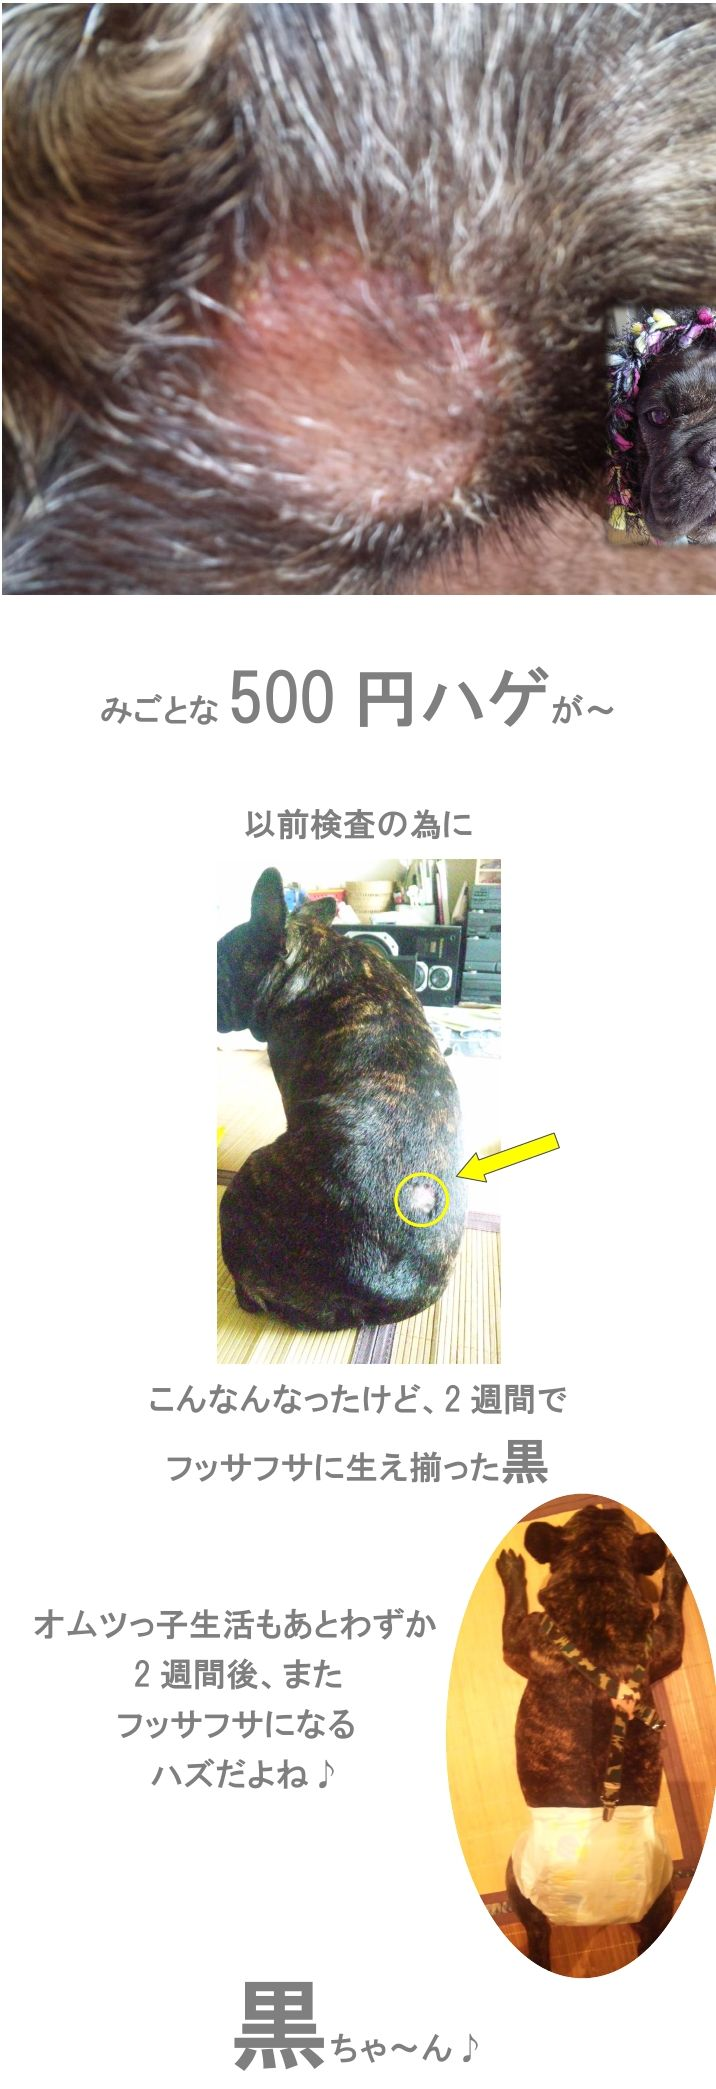 e0199784_15811.jpg